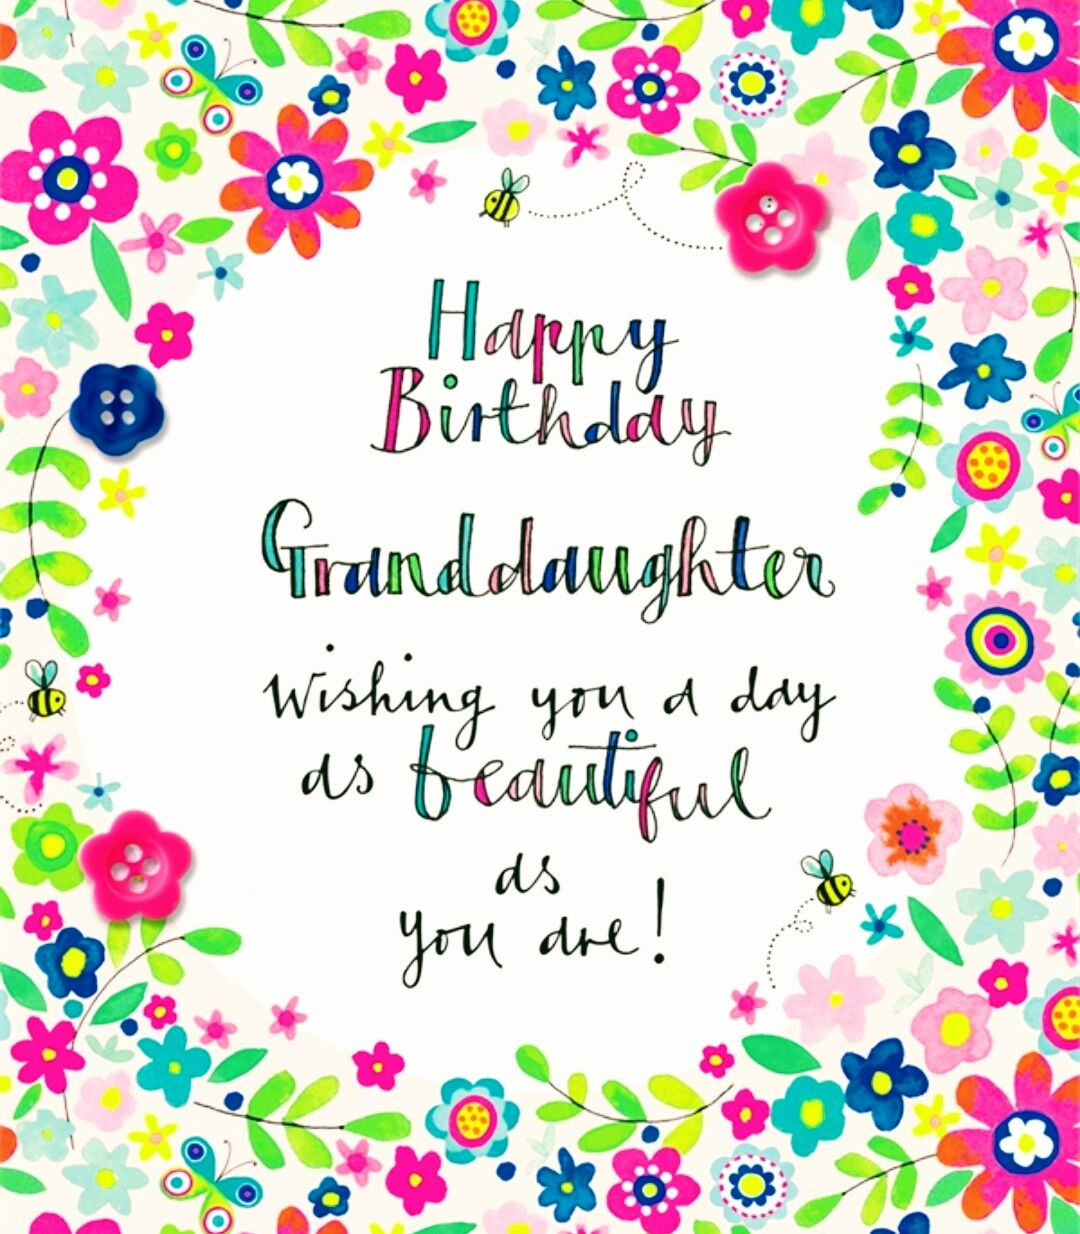 Happy Birthday Granddaughter! ☆♡ Birthday wishes